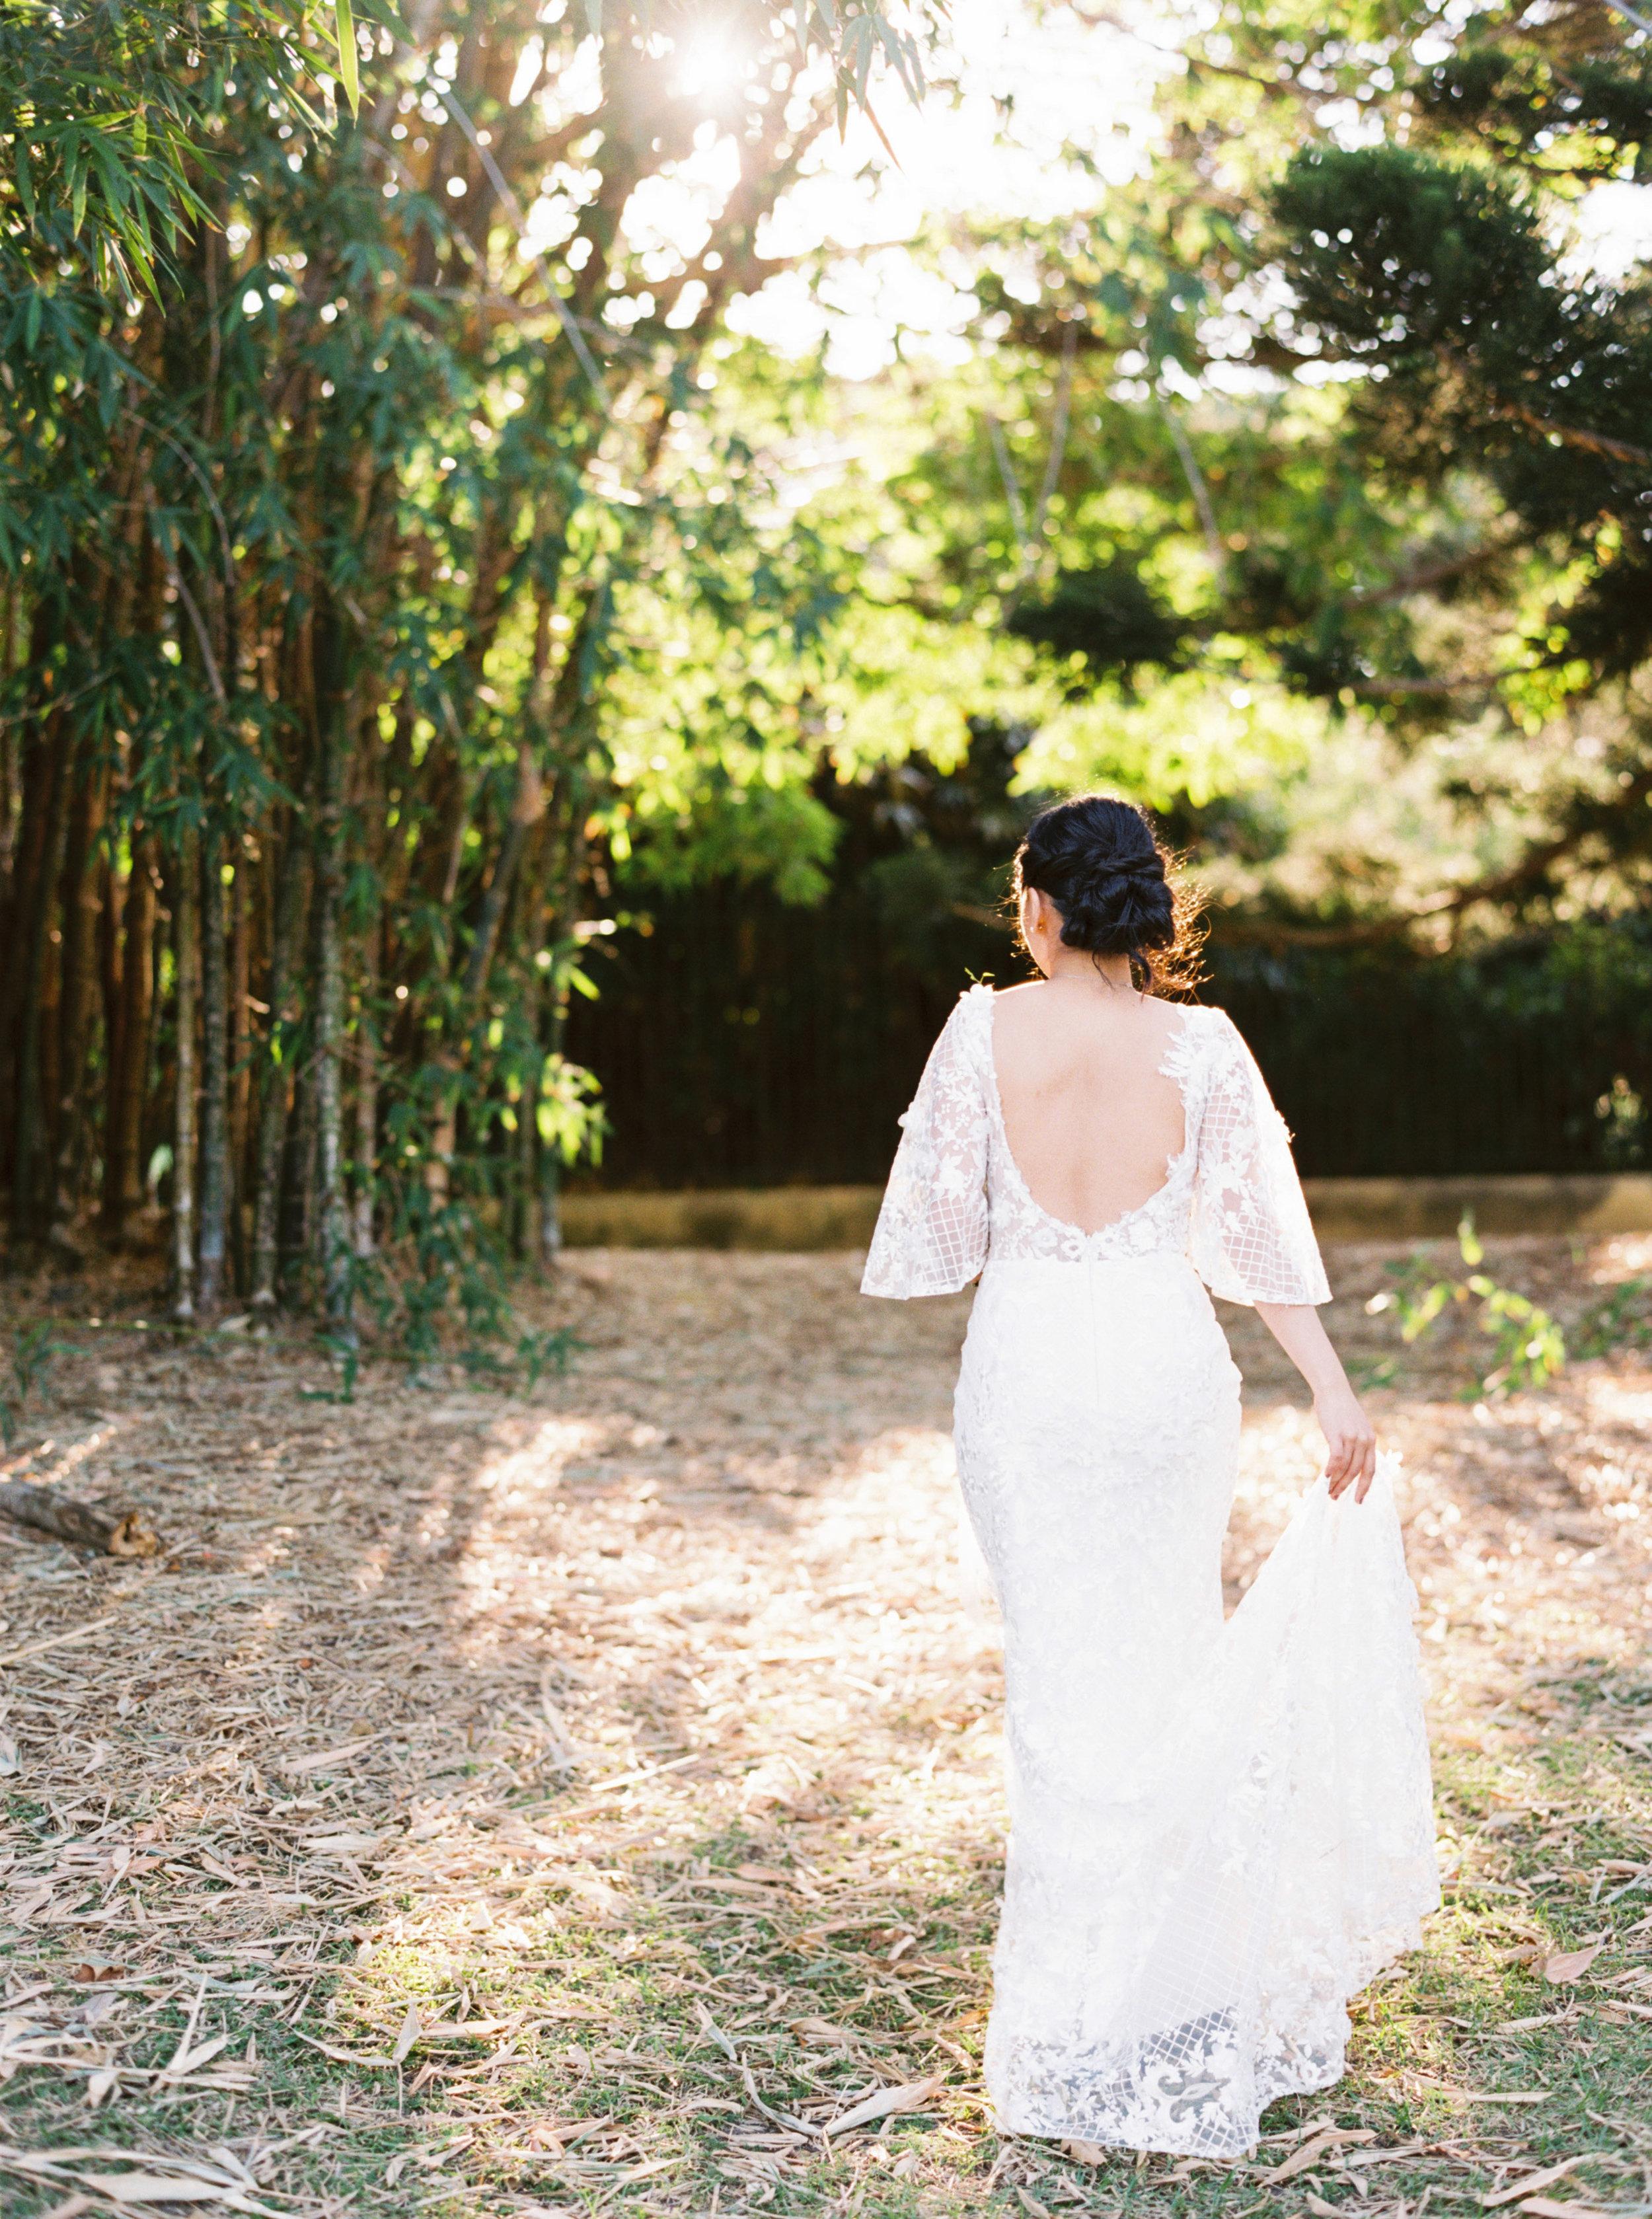 00020- Australia Sydney Wedding Photographer Sheri McMahon.jpg